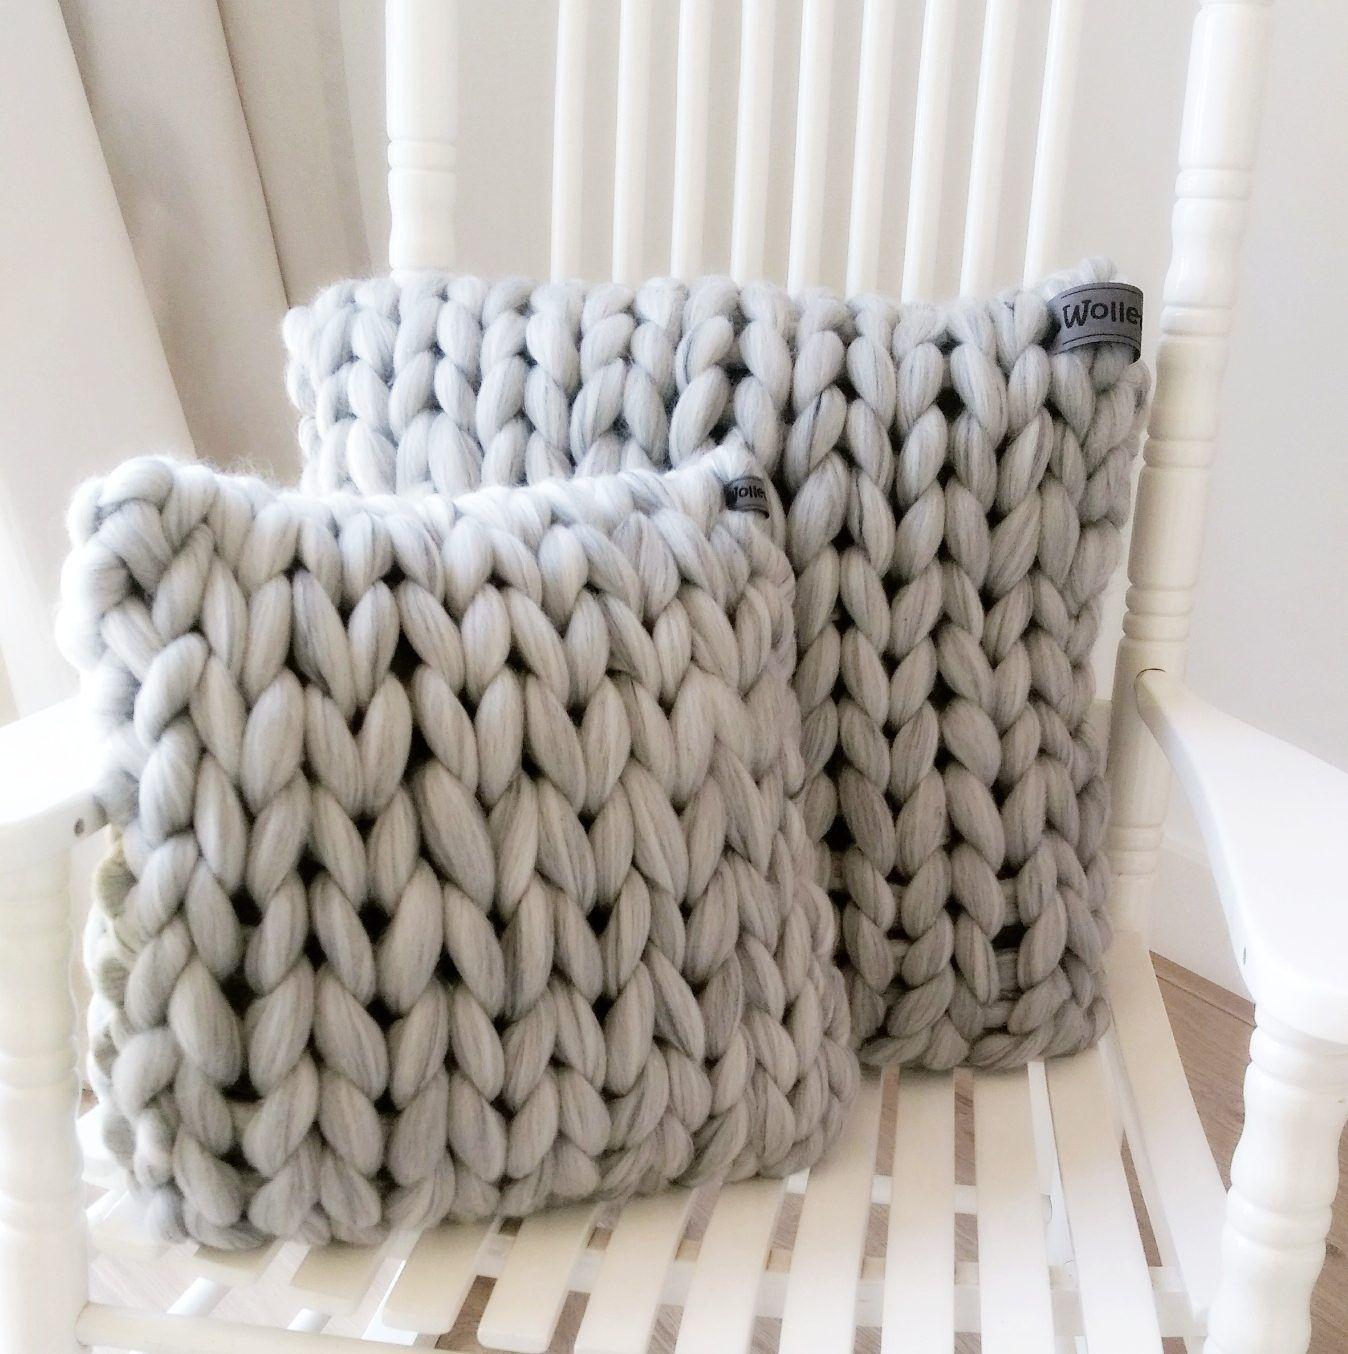 wwwwolletjebolnl chunky merino grof gebreid plaid deken